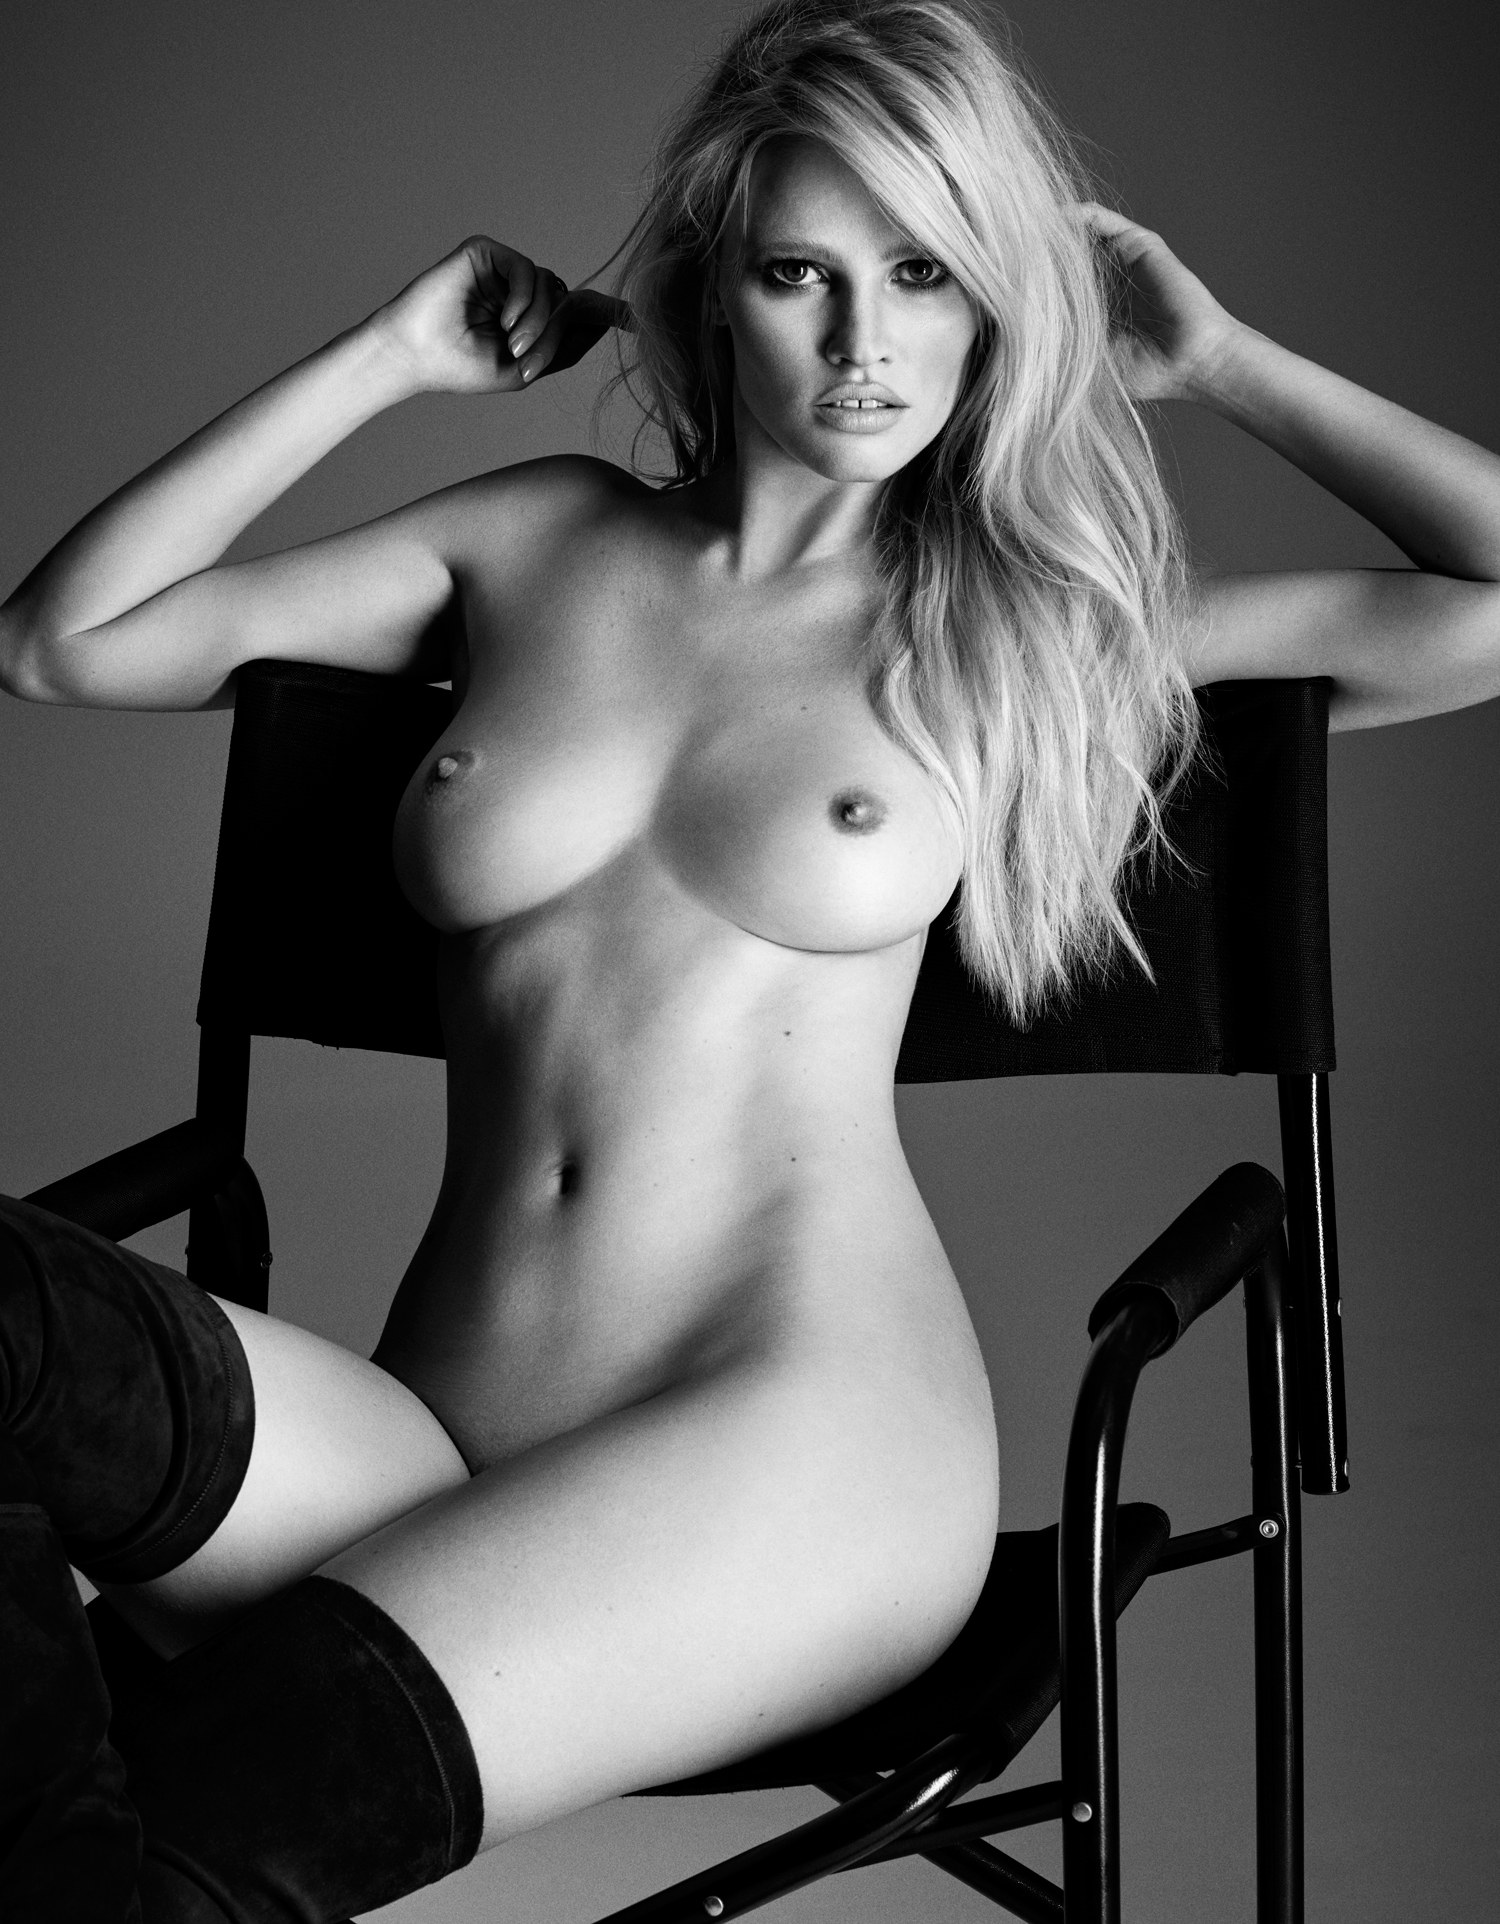 Topless sheffield